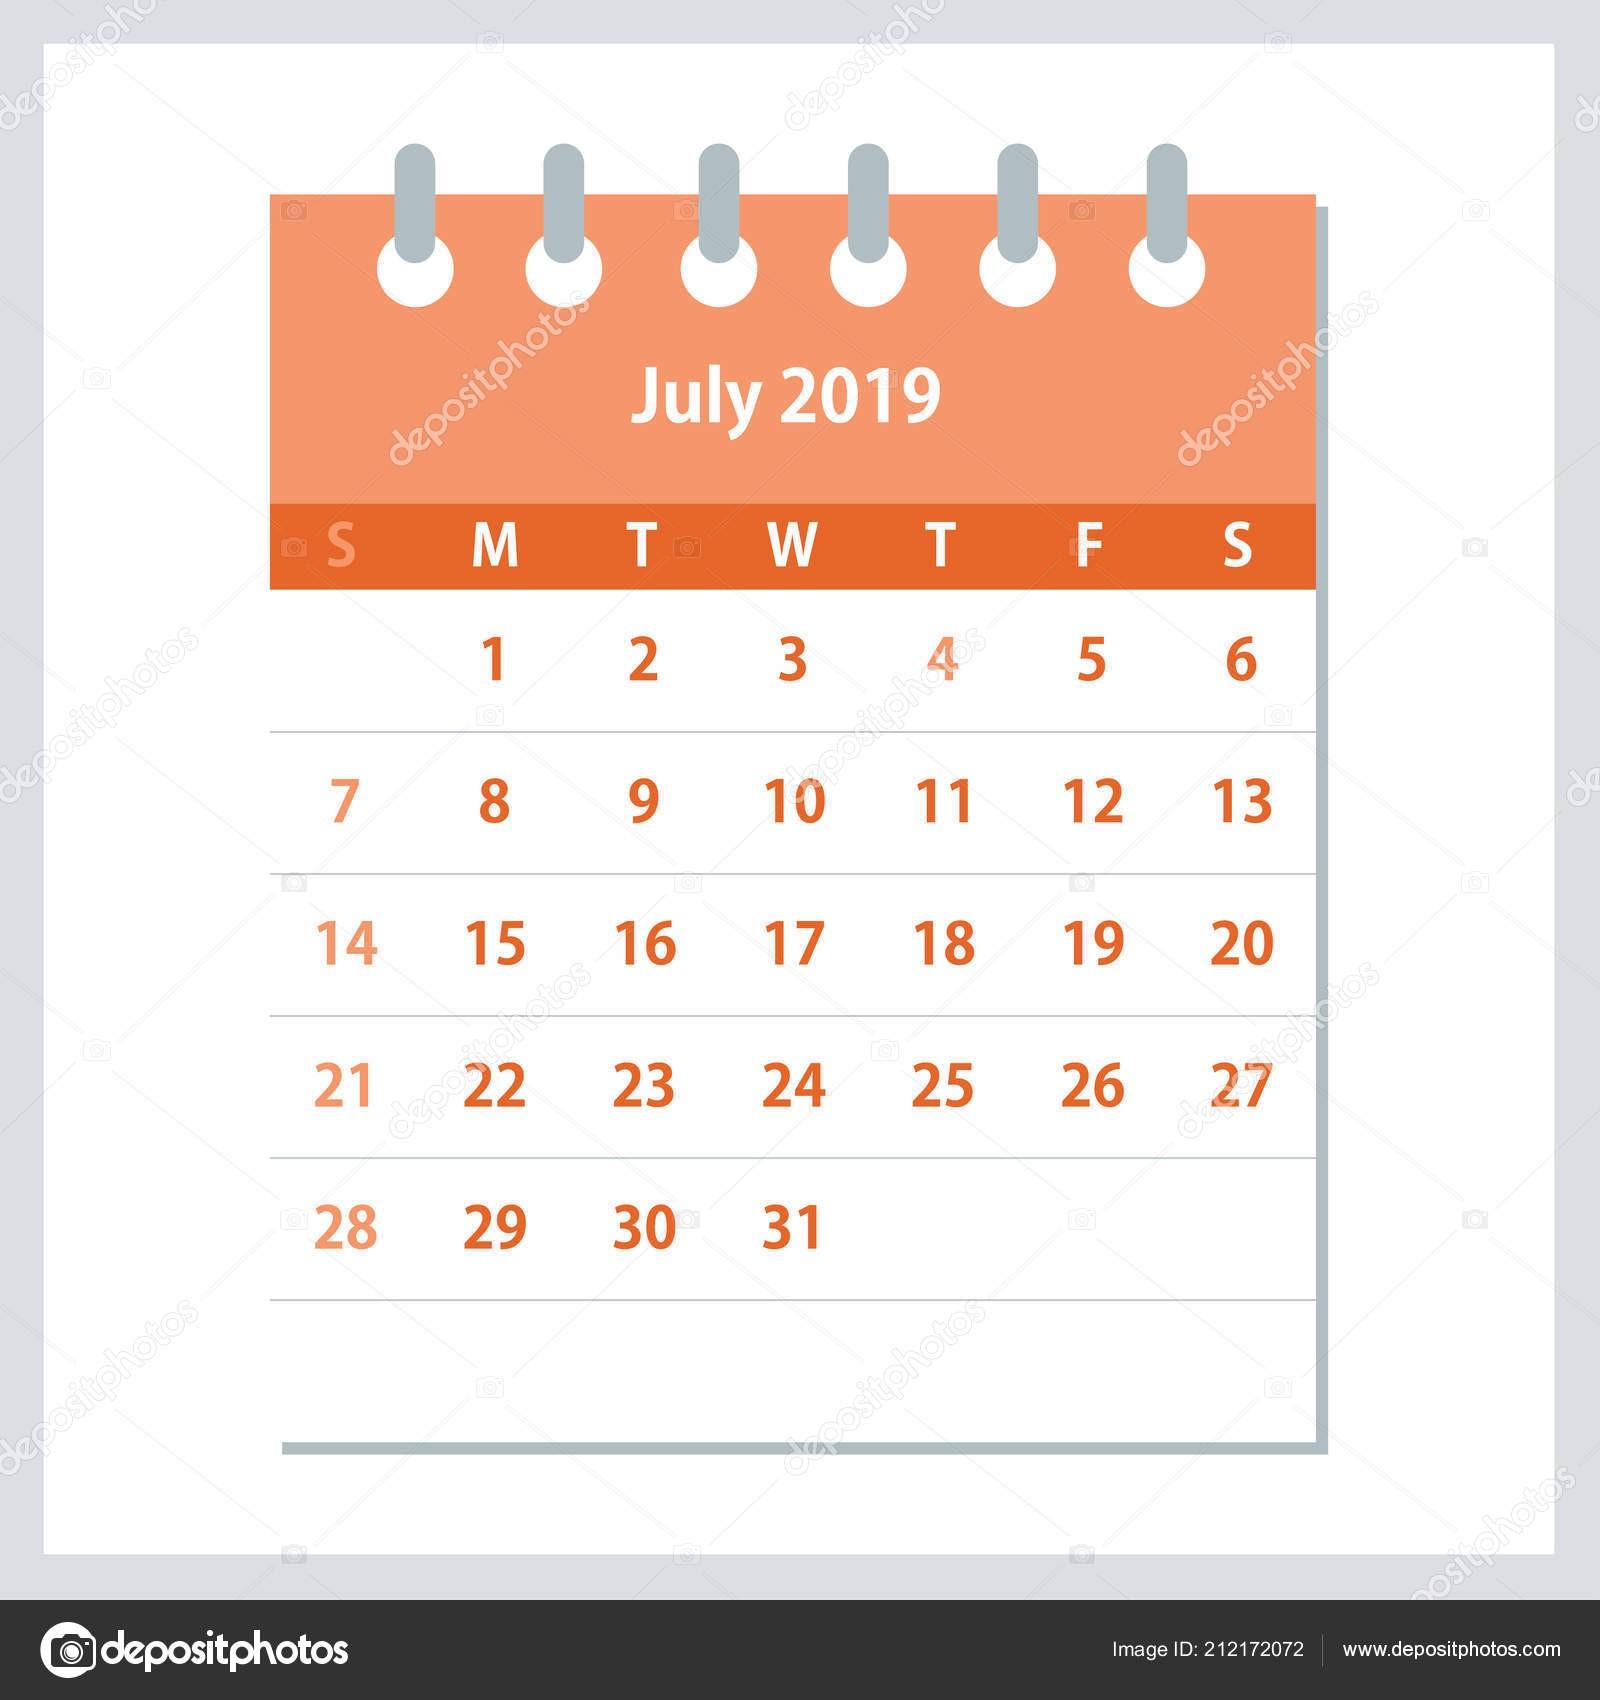 depositphotos stock illustration july 2019 calendar leaf monthly